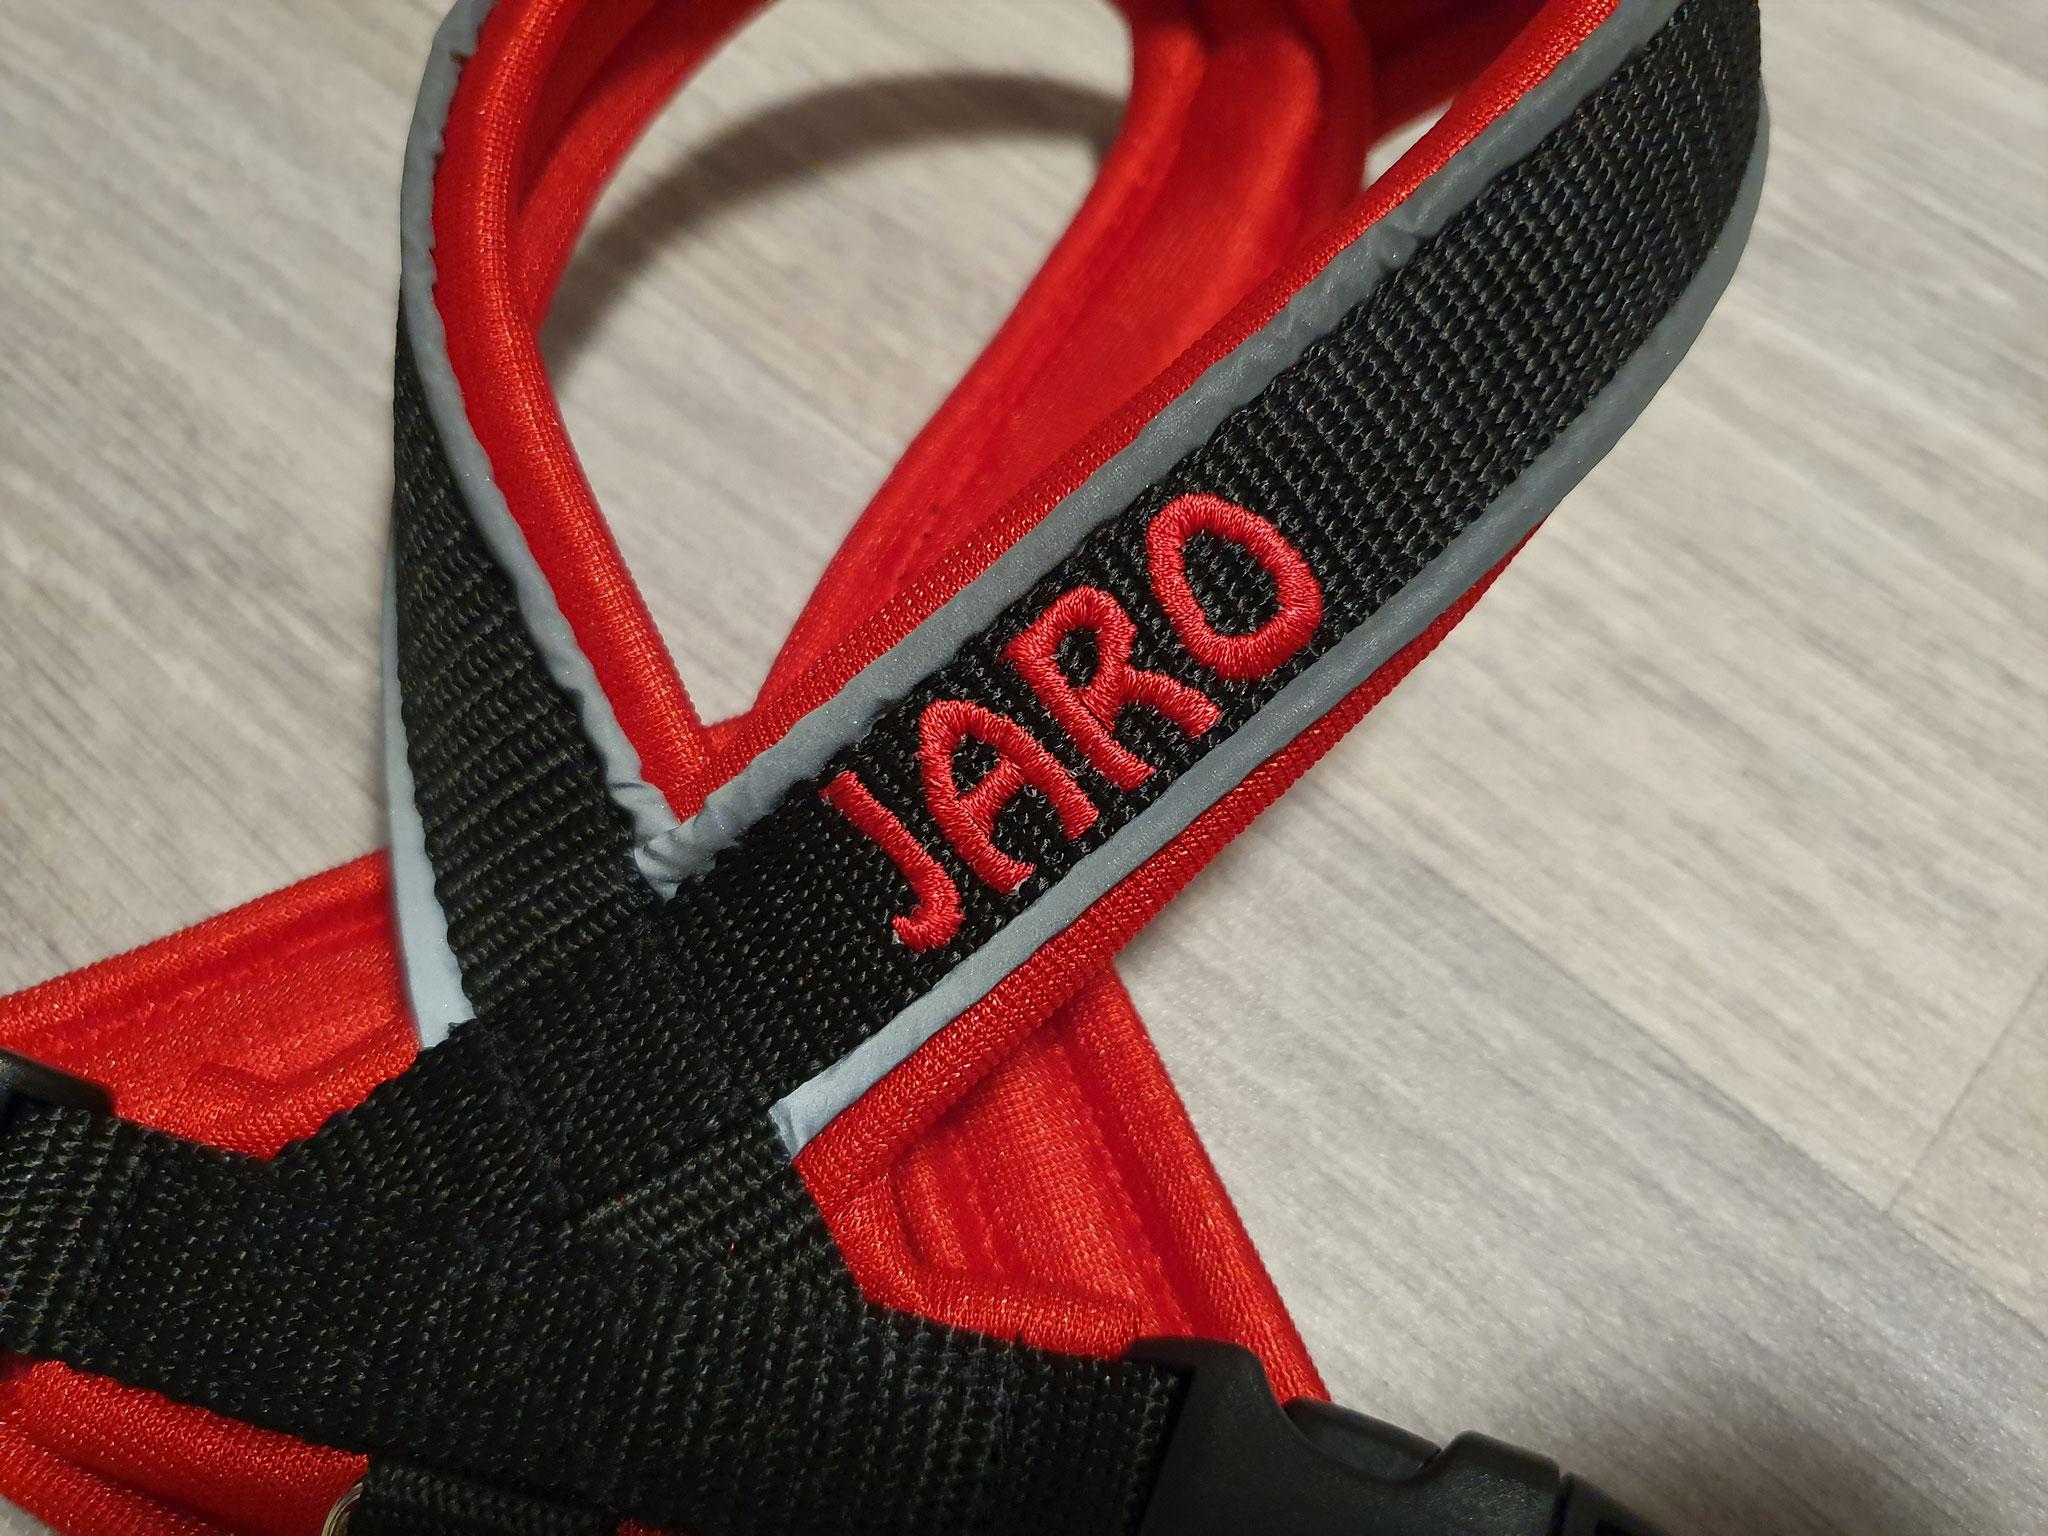 Perfect fit Geschirr schwarz/rot, reflektierende Paspeln, bestickt Jaro